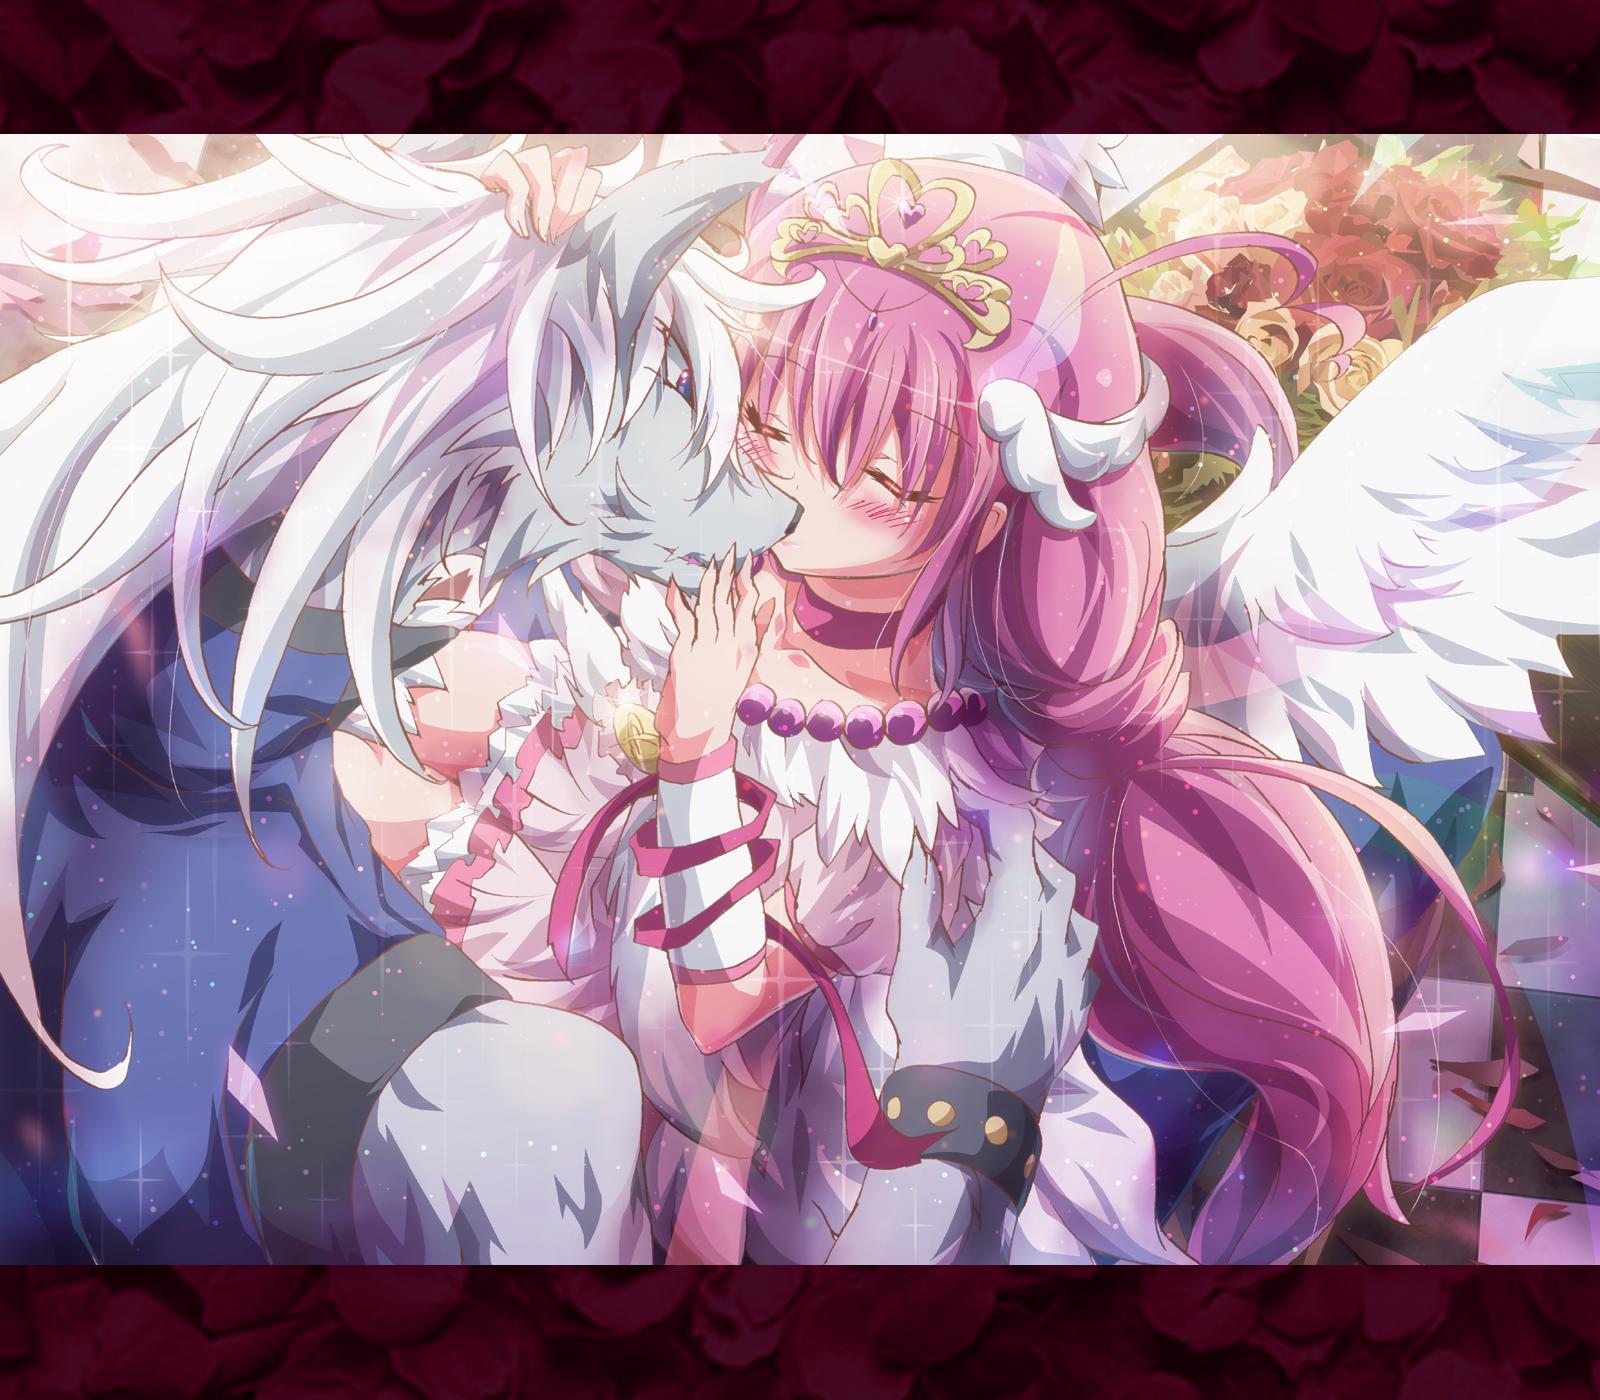 Smile Precure Zerochan Anime Image Board